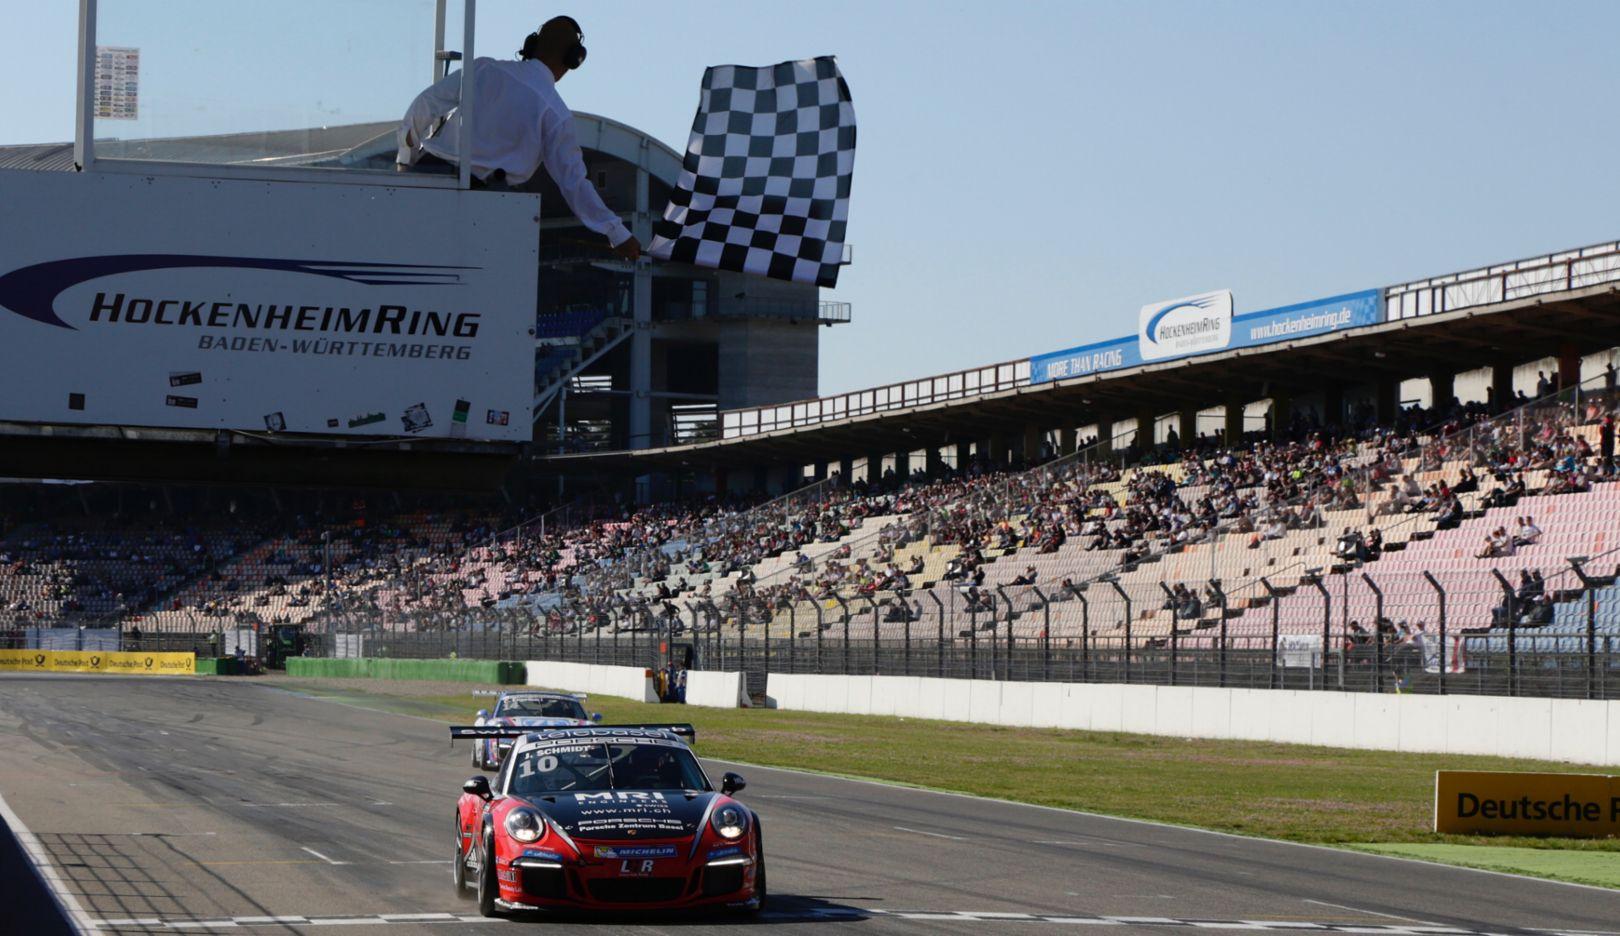 Jeffrey Schmidt, 911 GT3 Cup, Porsche Carrera Cup Deutschland, Hockenheimring, 2016, Porsche AG